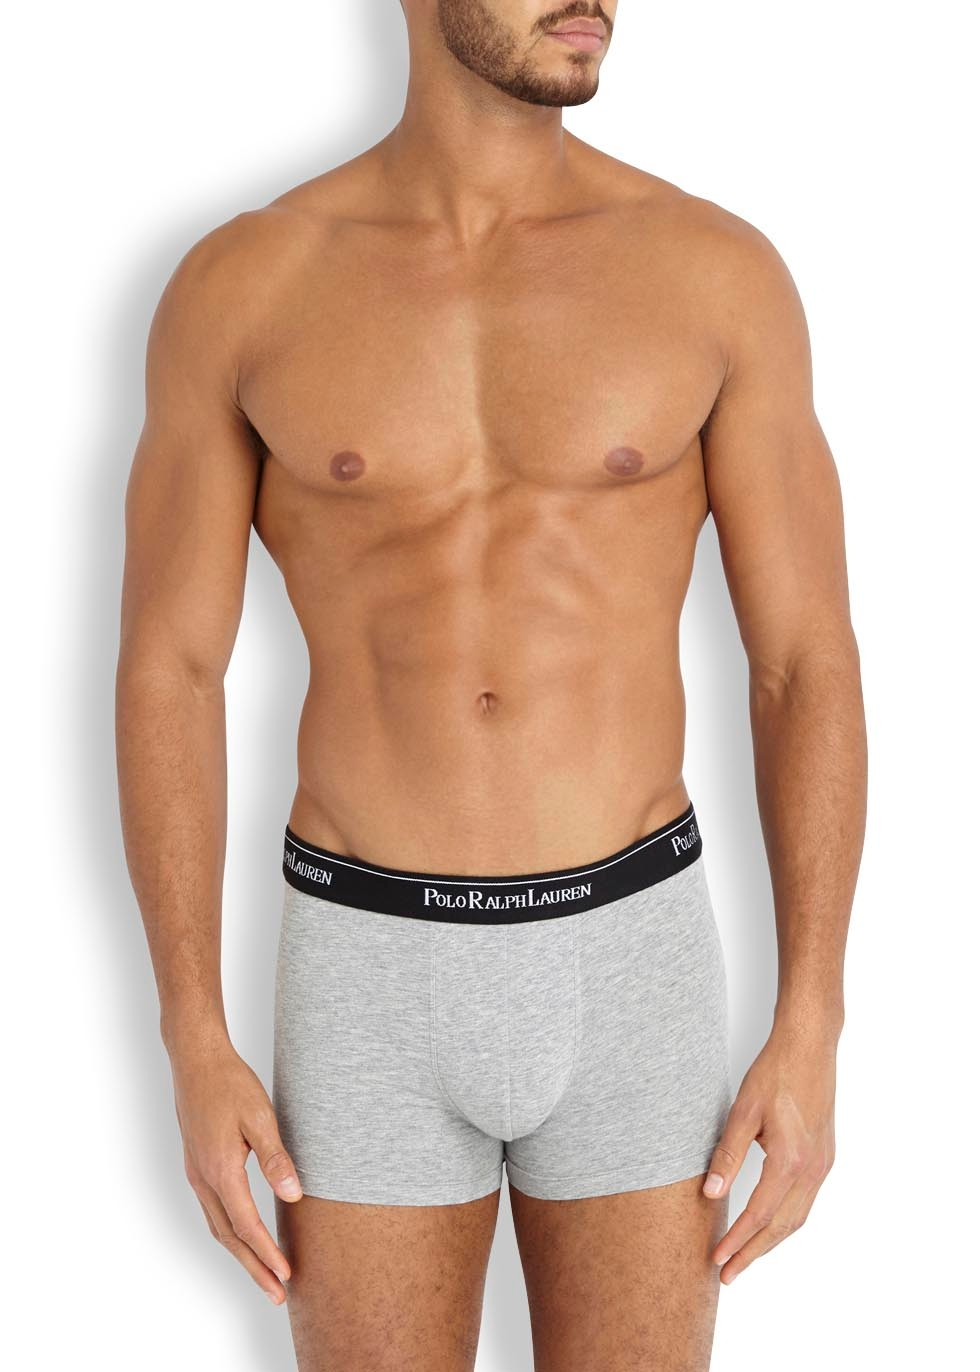 Stretch cotton boxer briefs - set of three - Polo Ralph Lauren